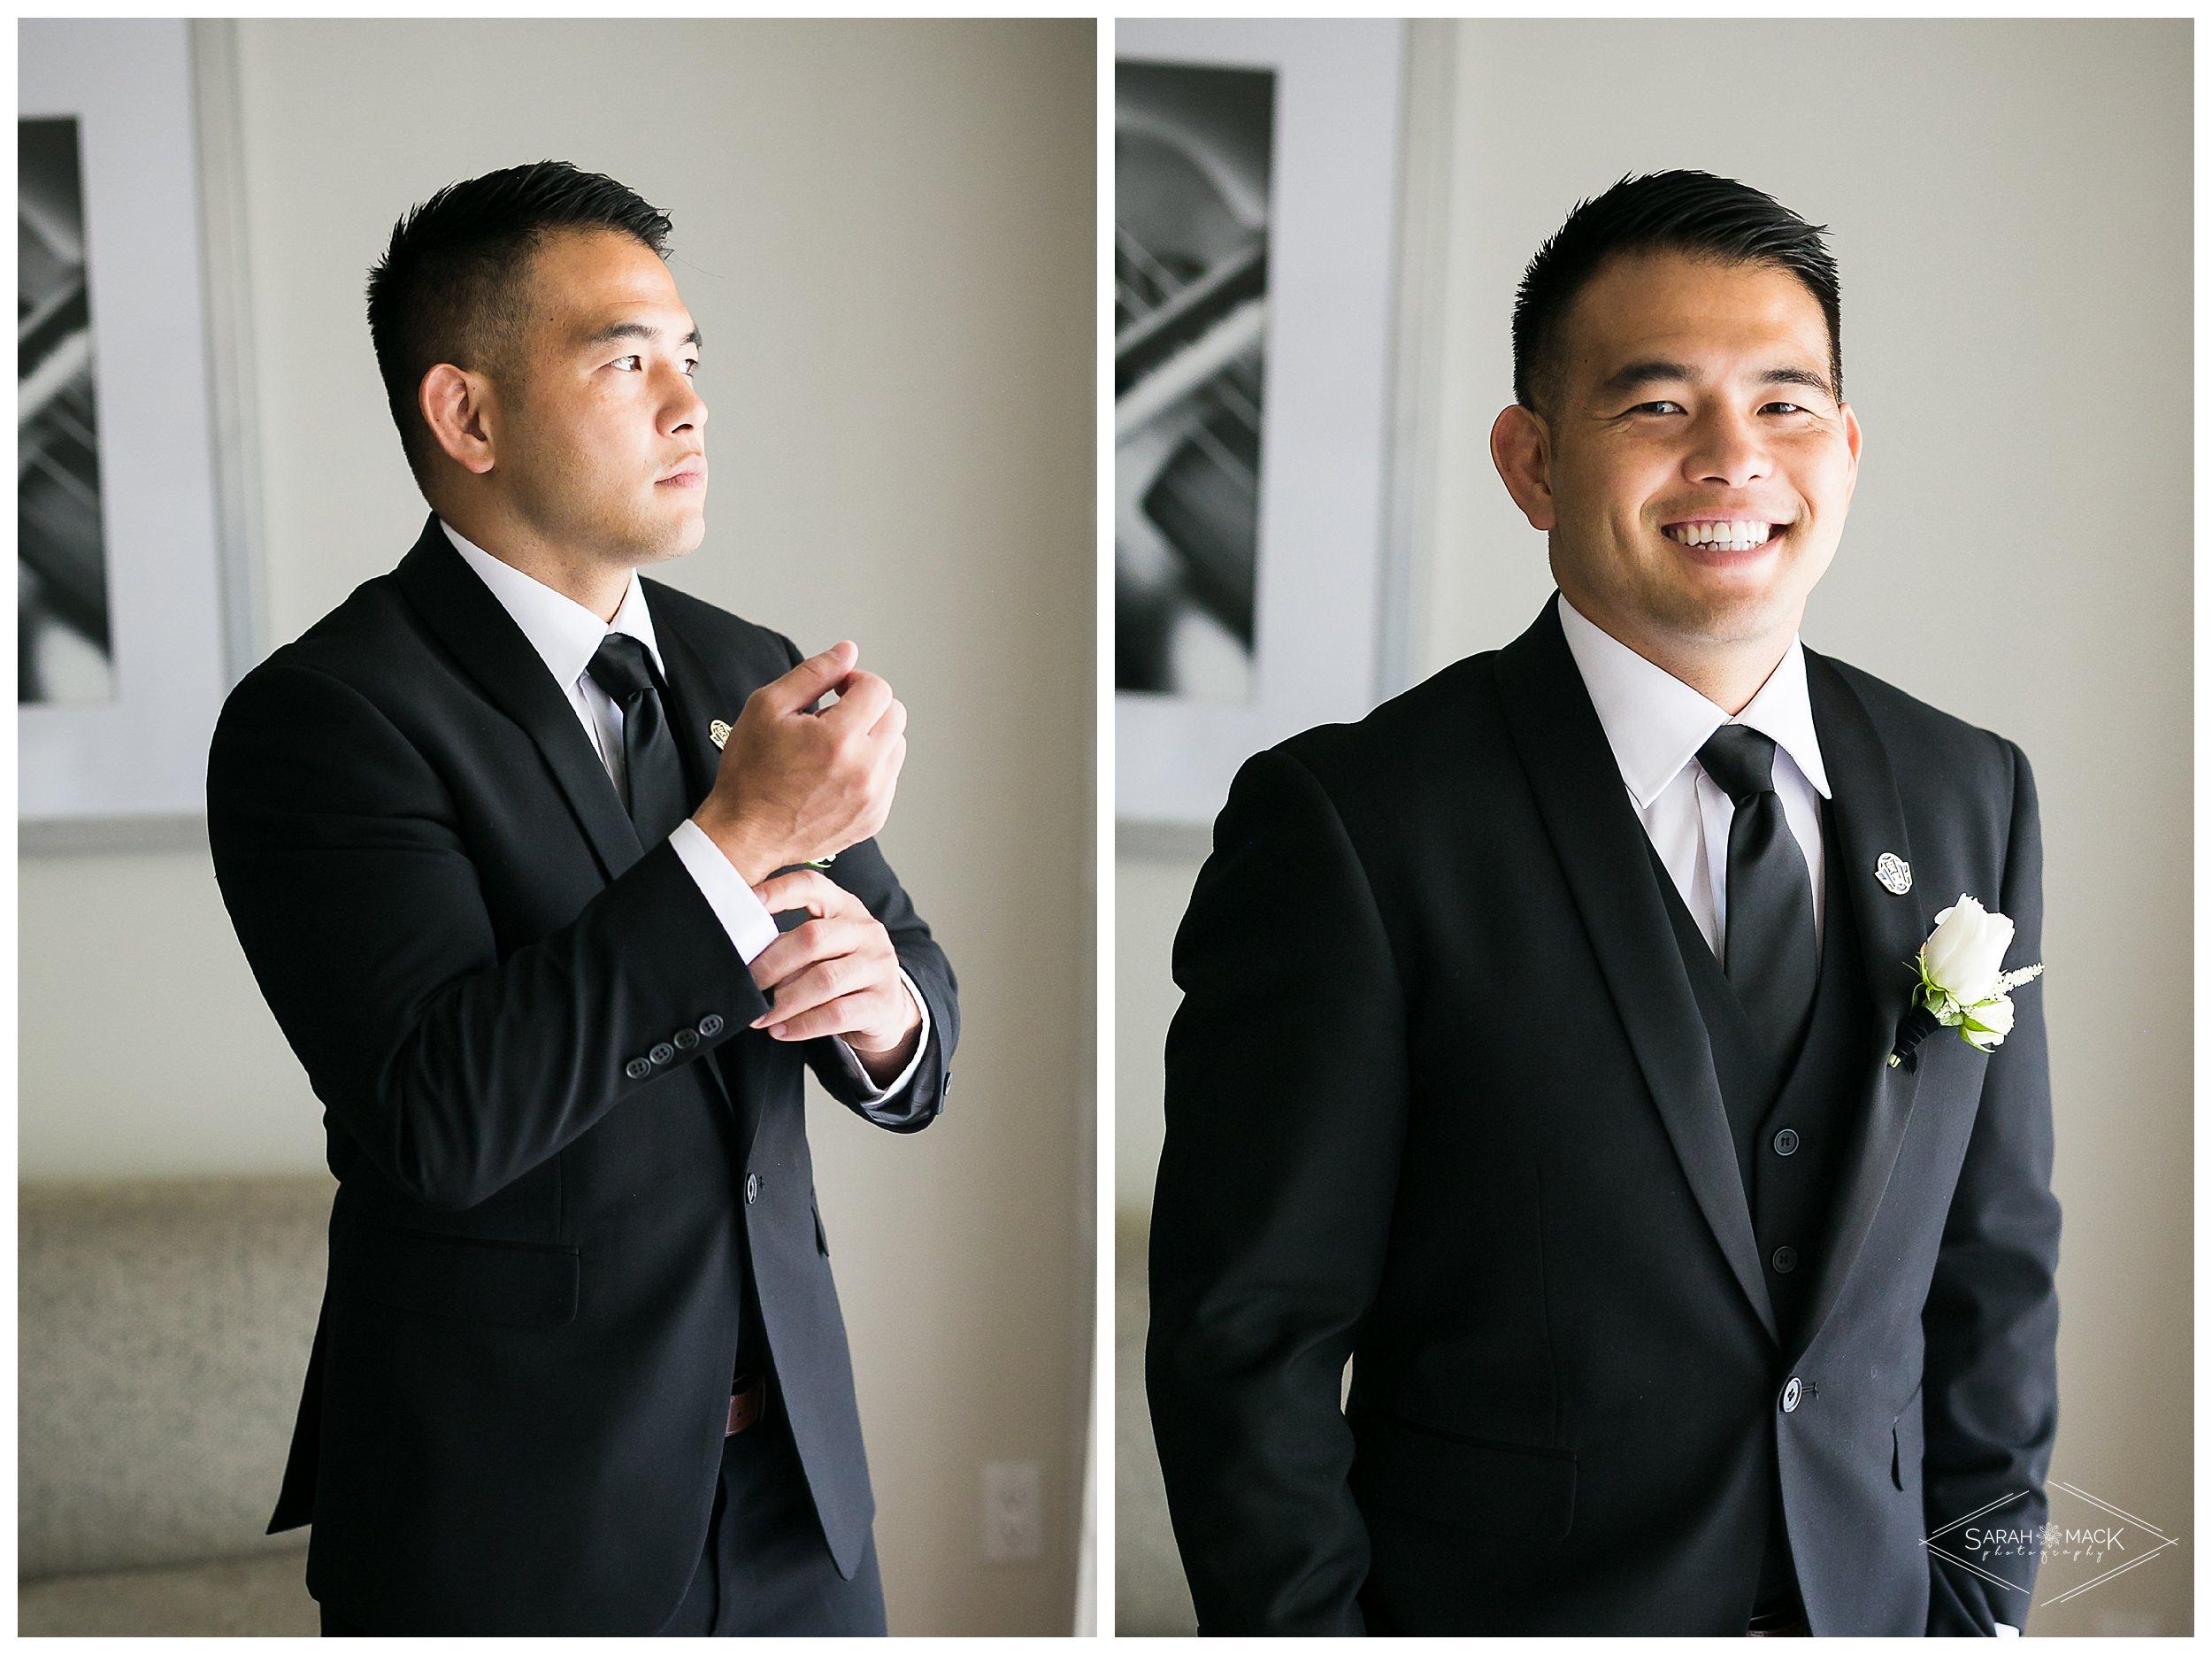 LE-Avenue-of-the-Arts-Costa-Mesa-Wedding-Photography-0044.jpg